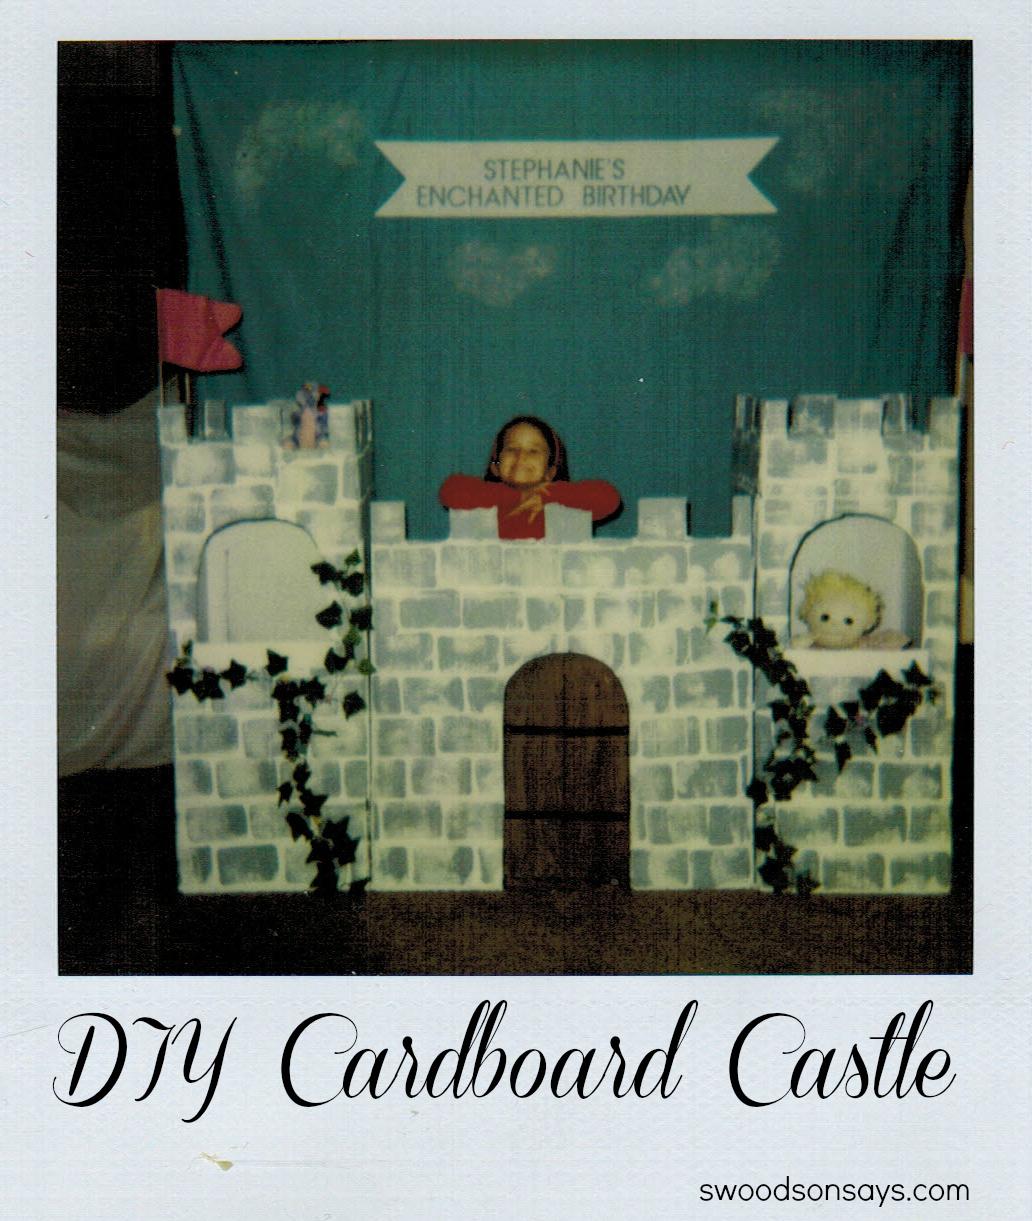 DIY Cardboard Castle - Swoodson Says